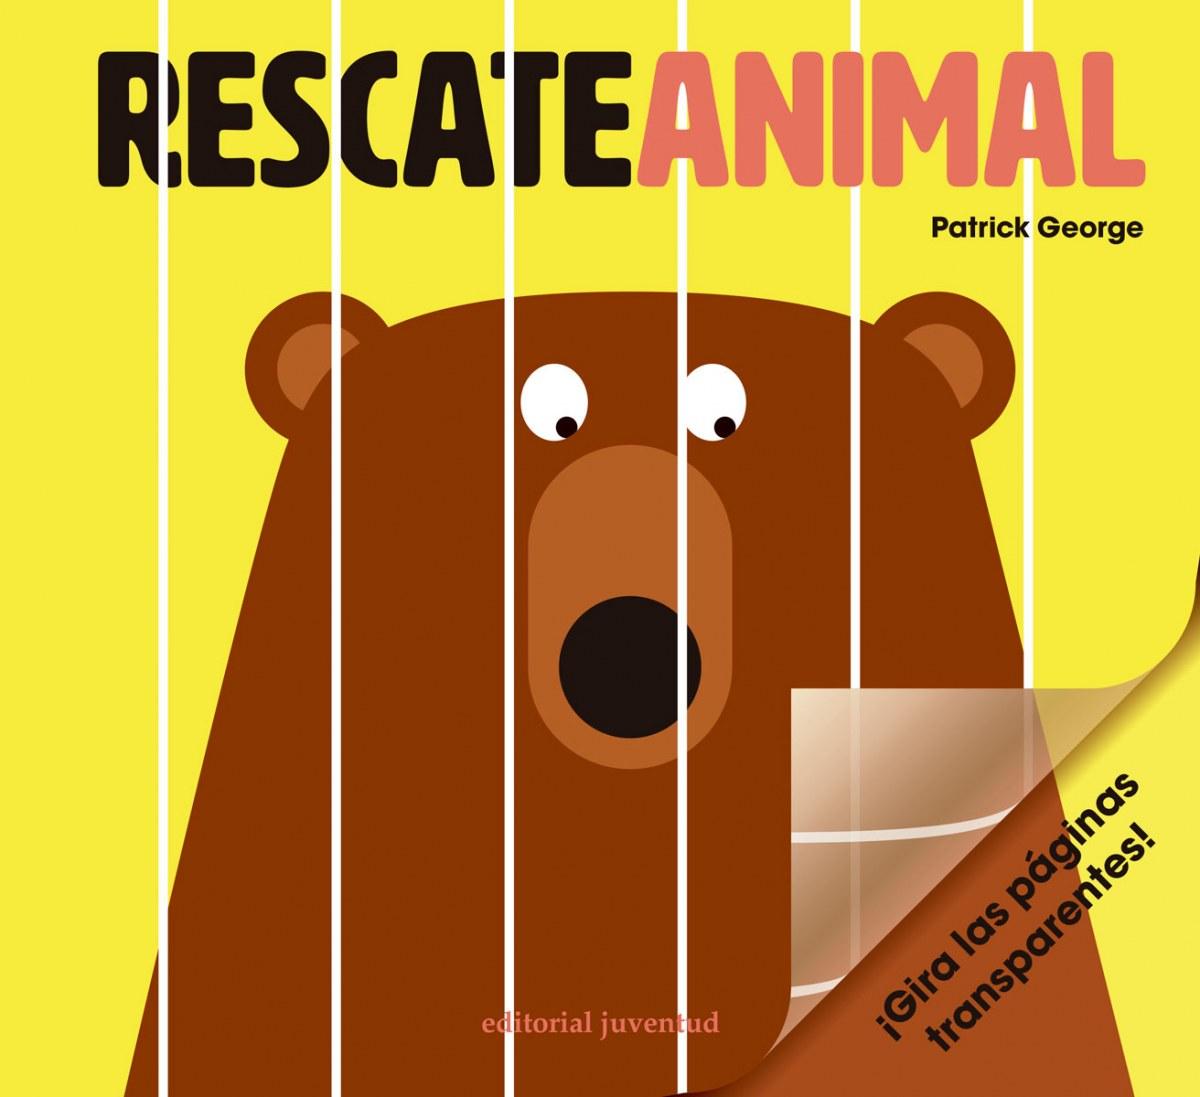 Rescate animal 9788426143389